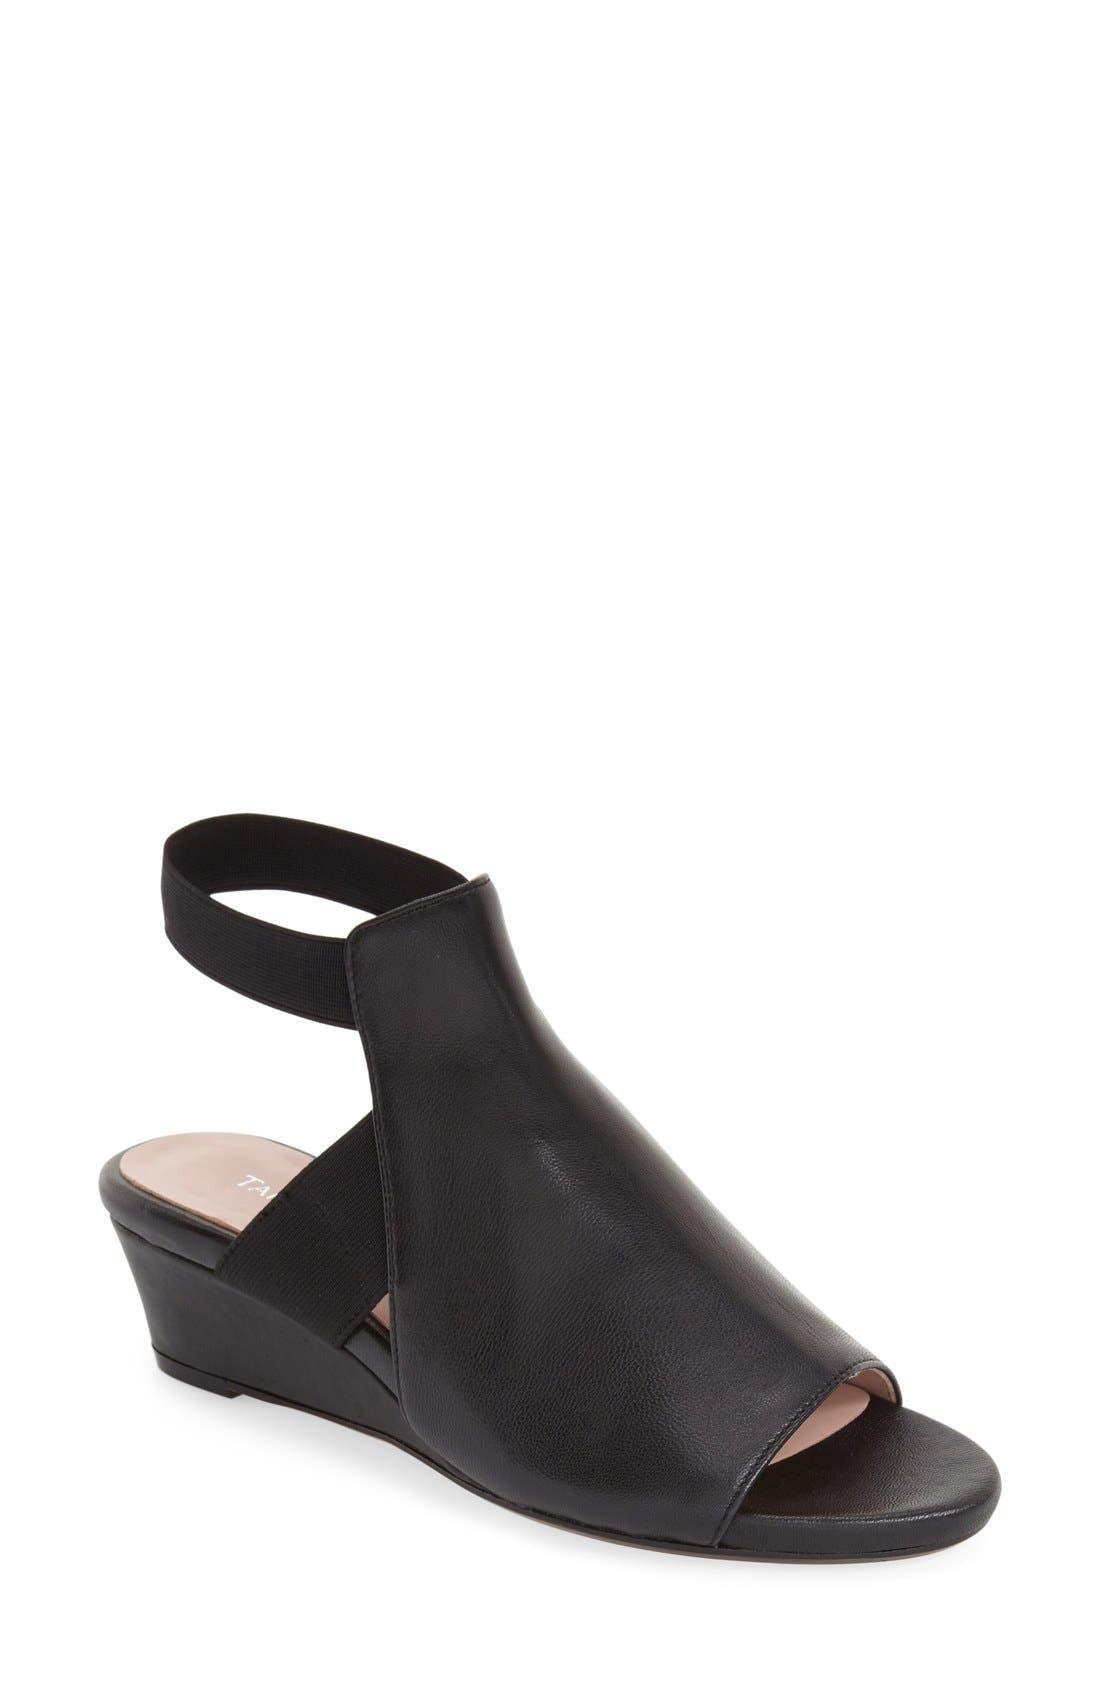 Alternate Image 1 Selected - Taryn Rose 'Shye' Wedge Sandal (Women)